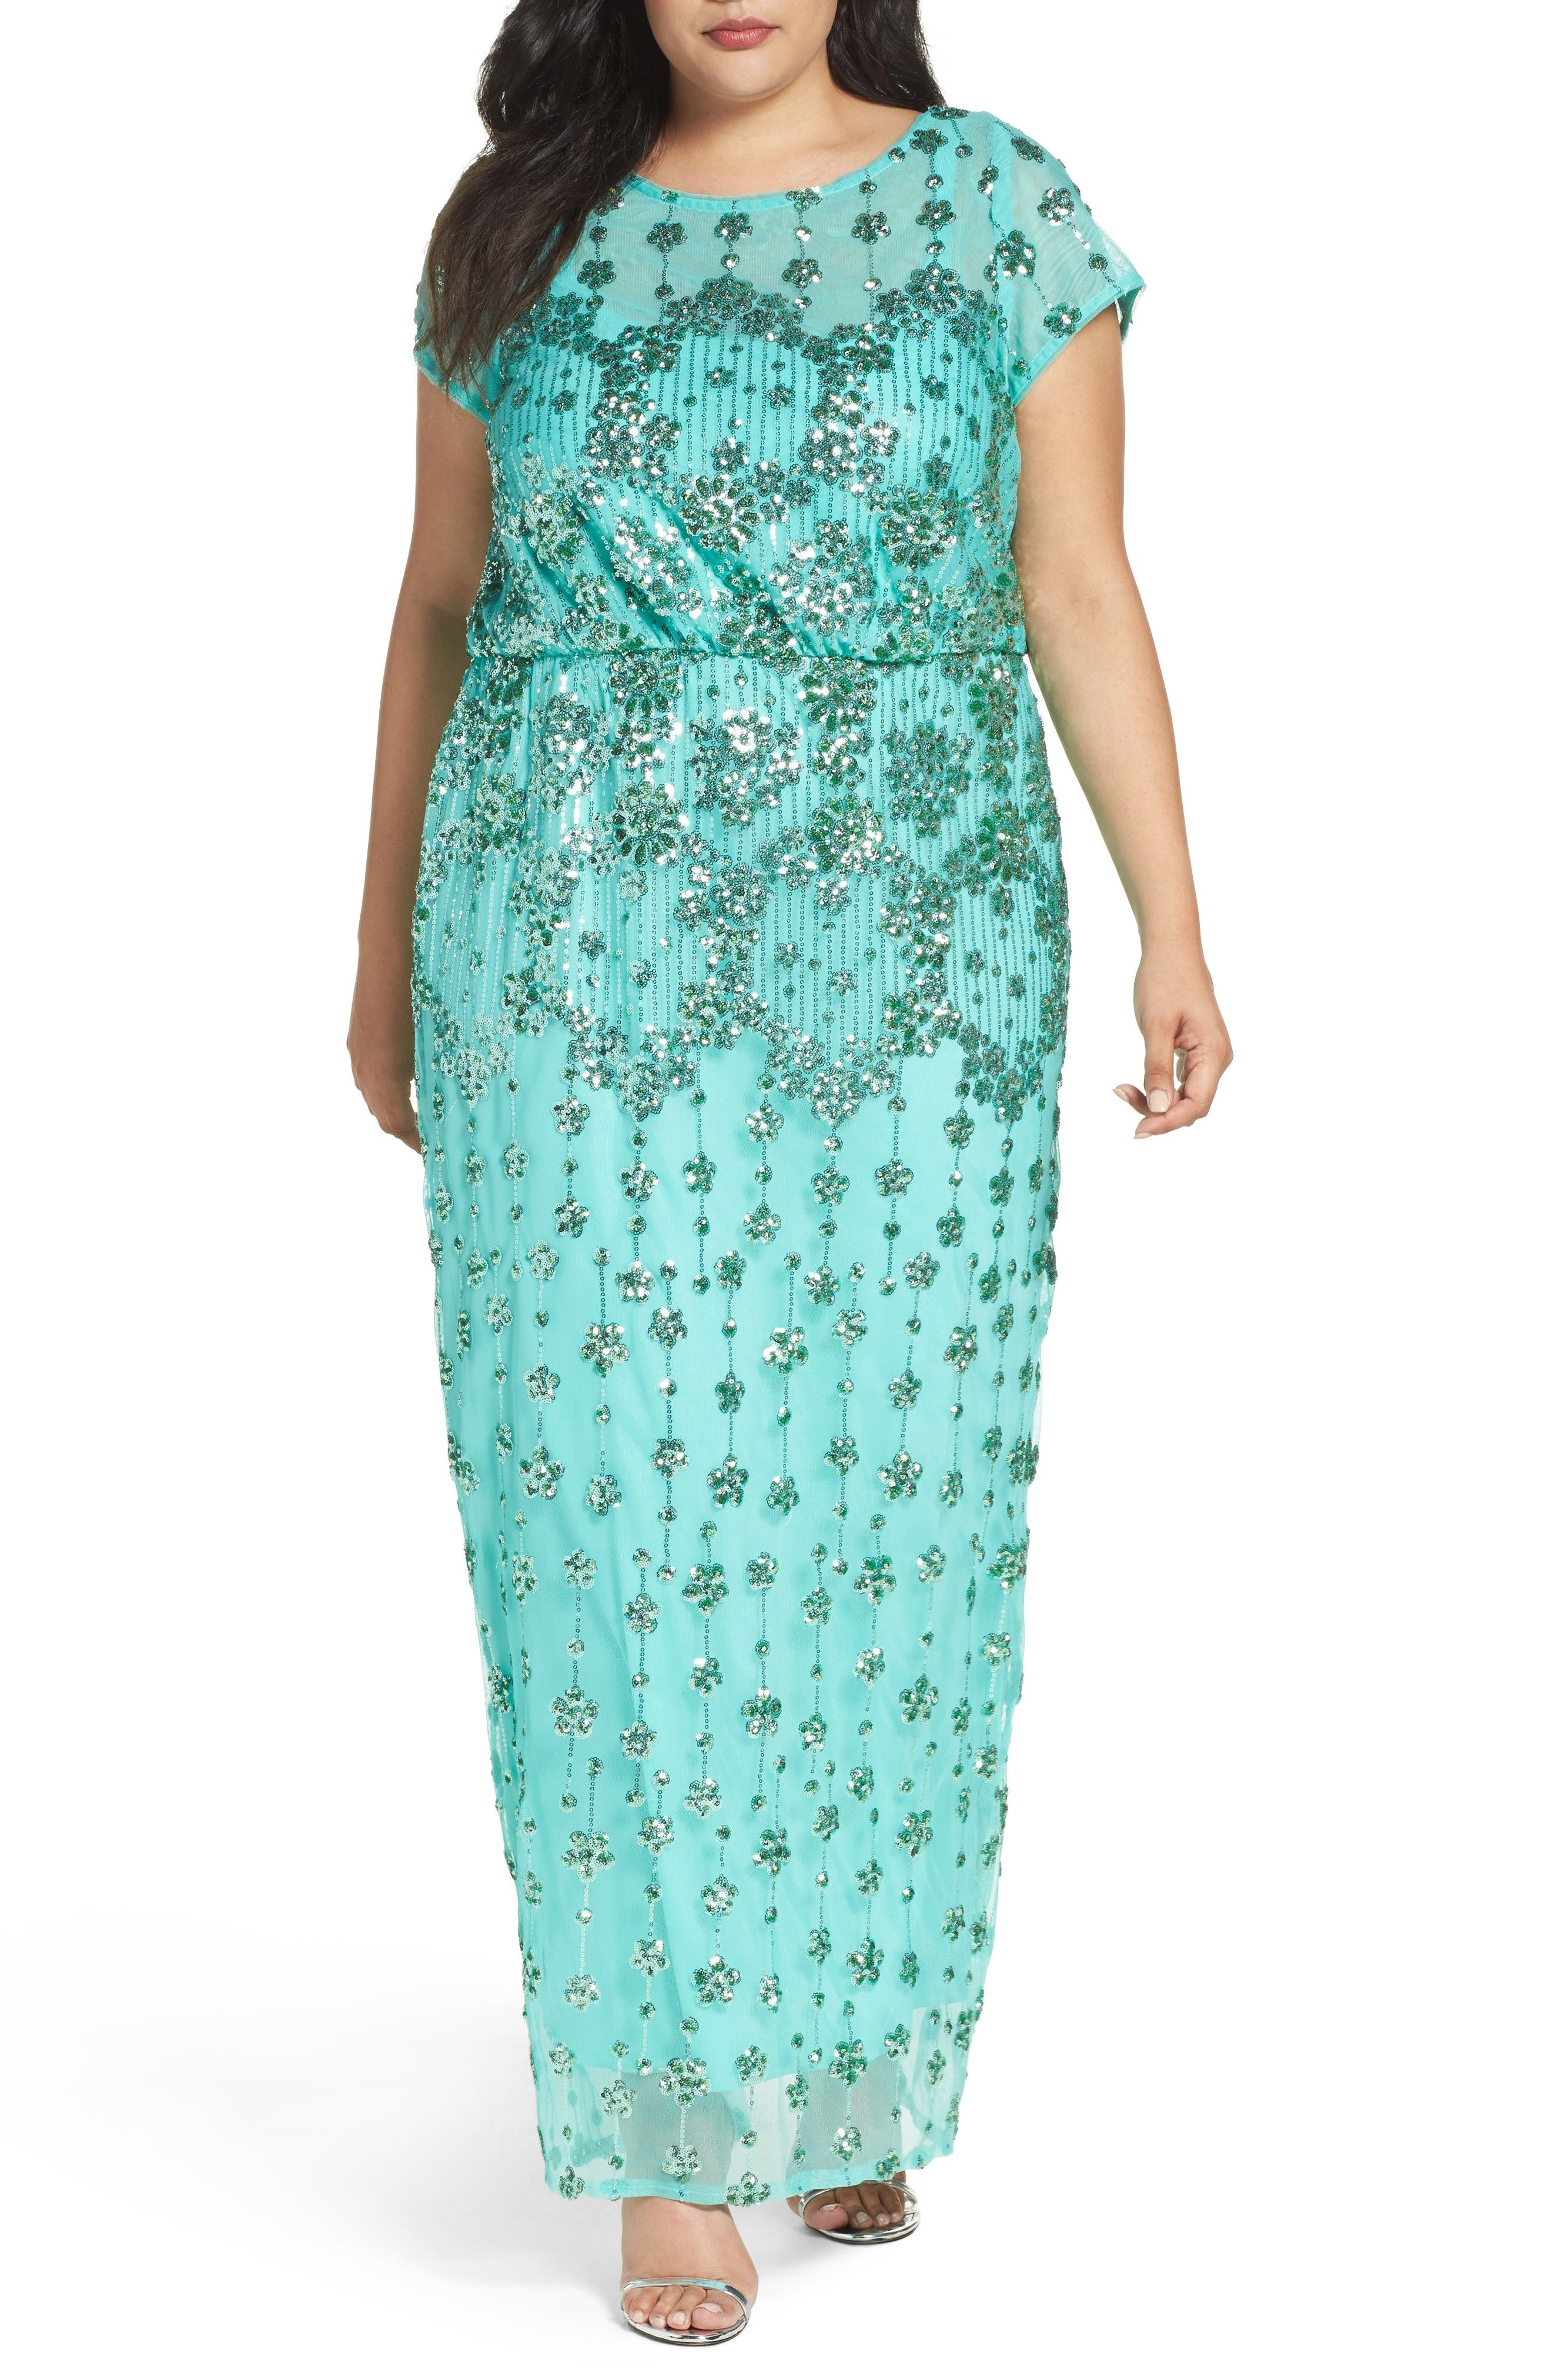 b5c10ca0bebd5 New Brianna Embellished Blouson Gown (Plus Size)